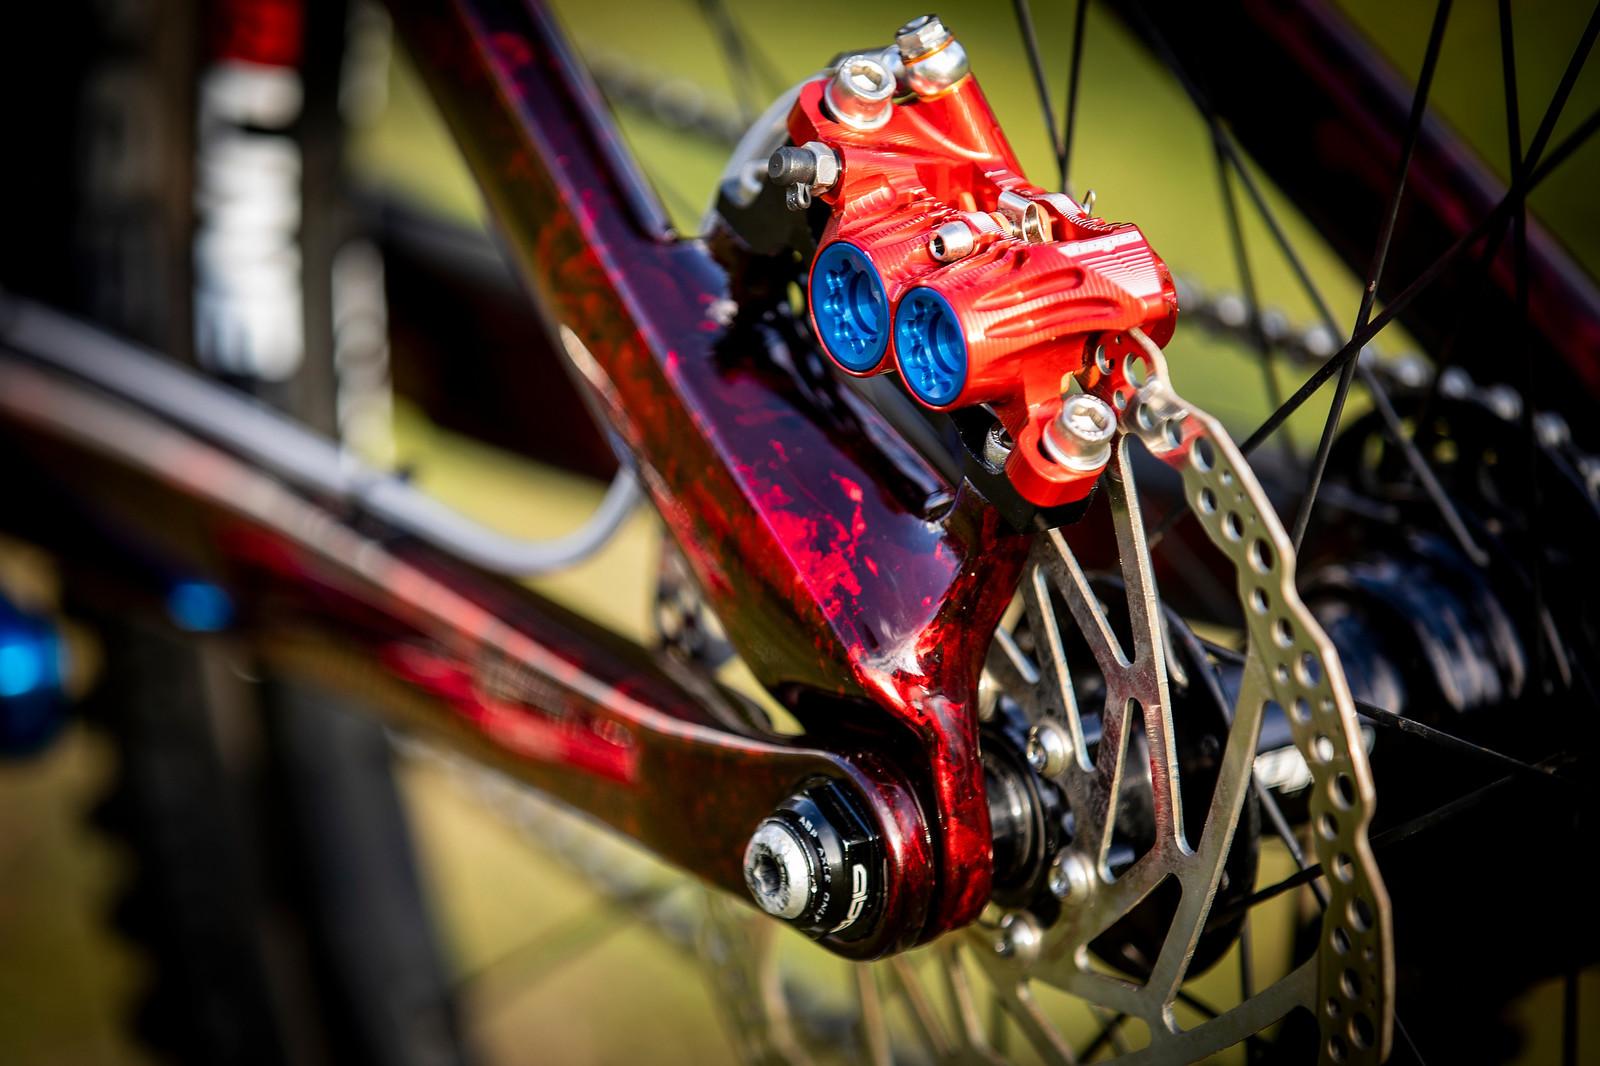 Mix and Match - WORLD CHAMPS BIKE - Kade Edwards' Trek Session - Mountain Biking Pictures - Vital MTB